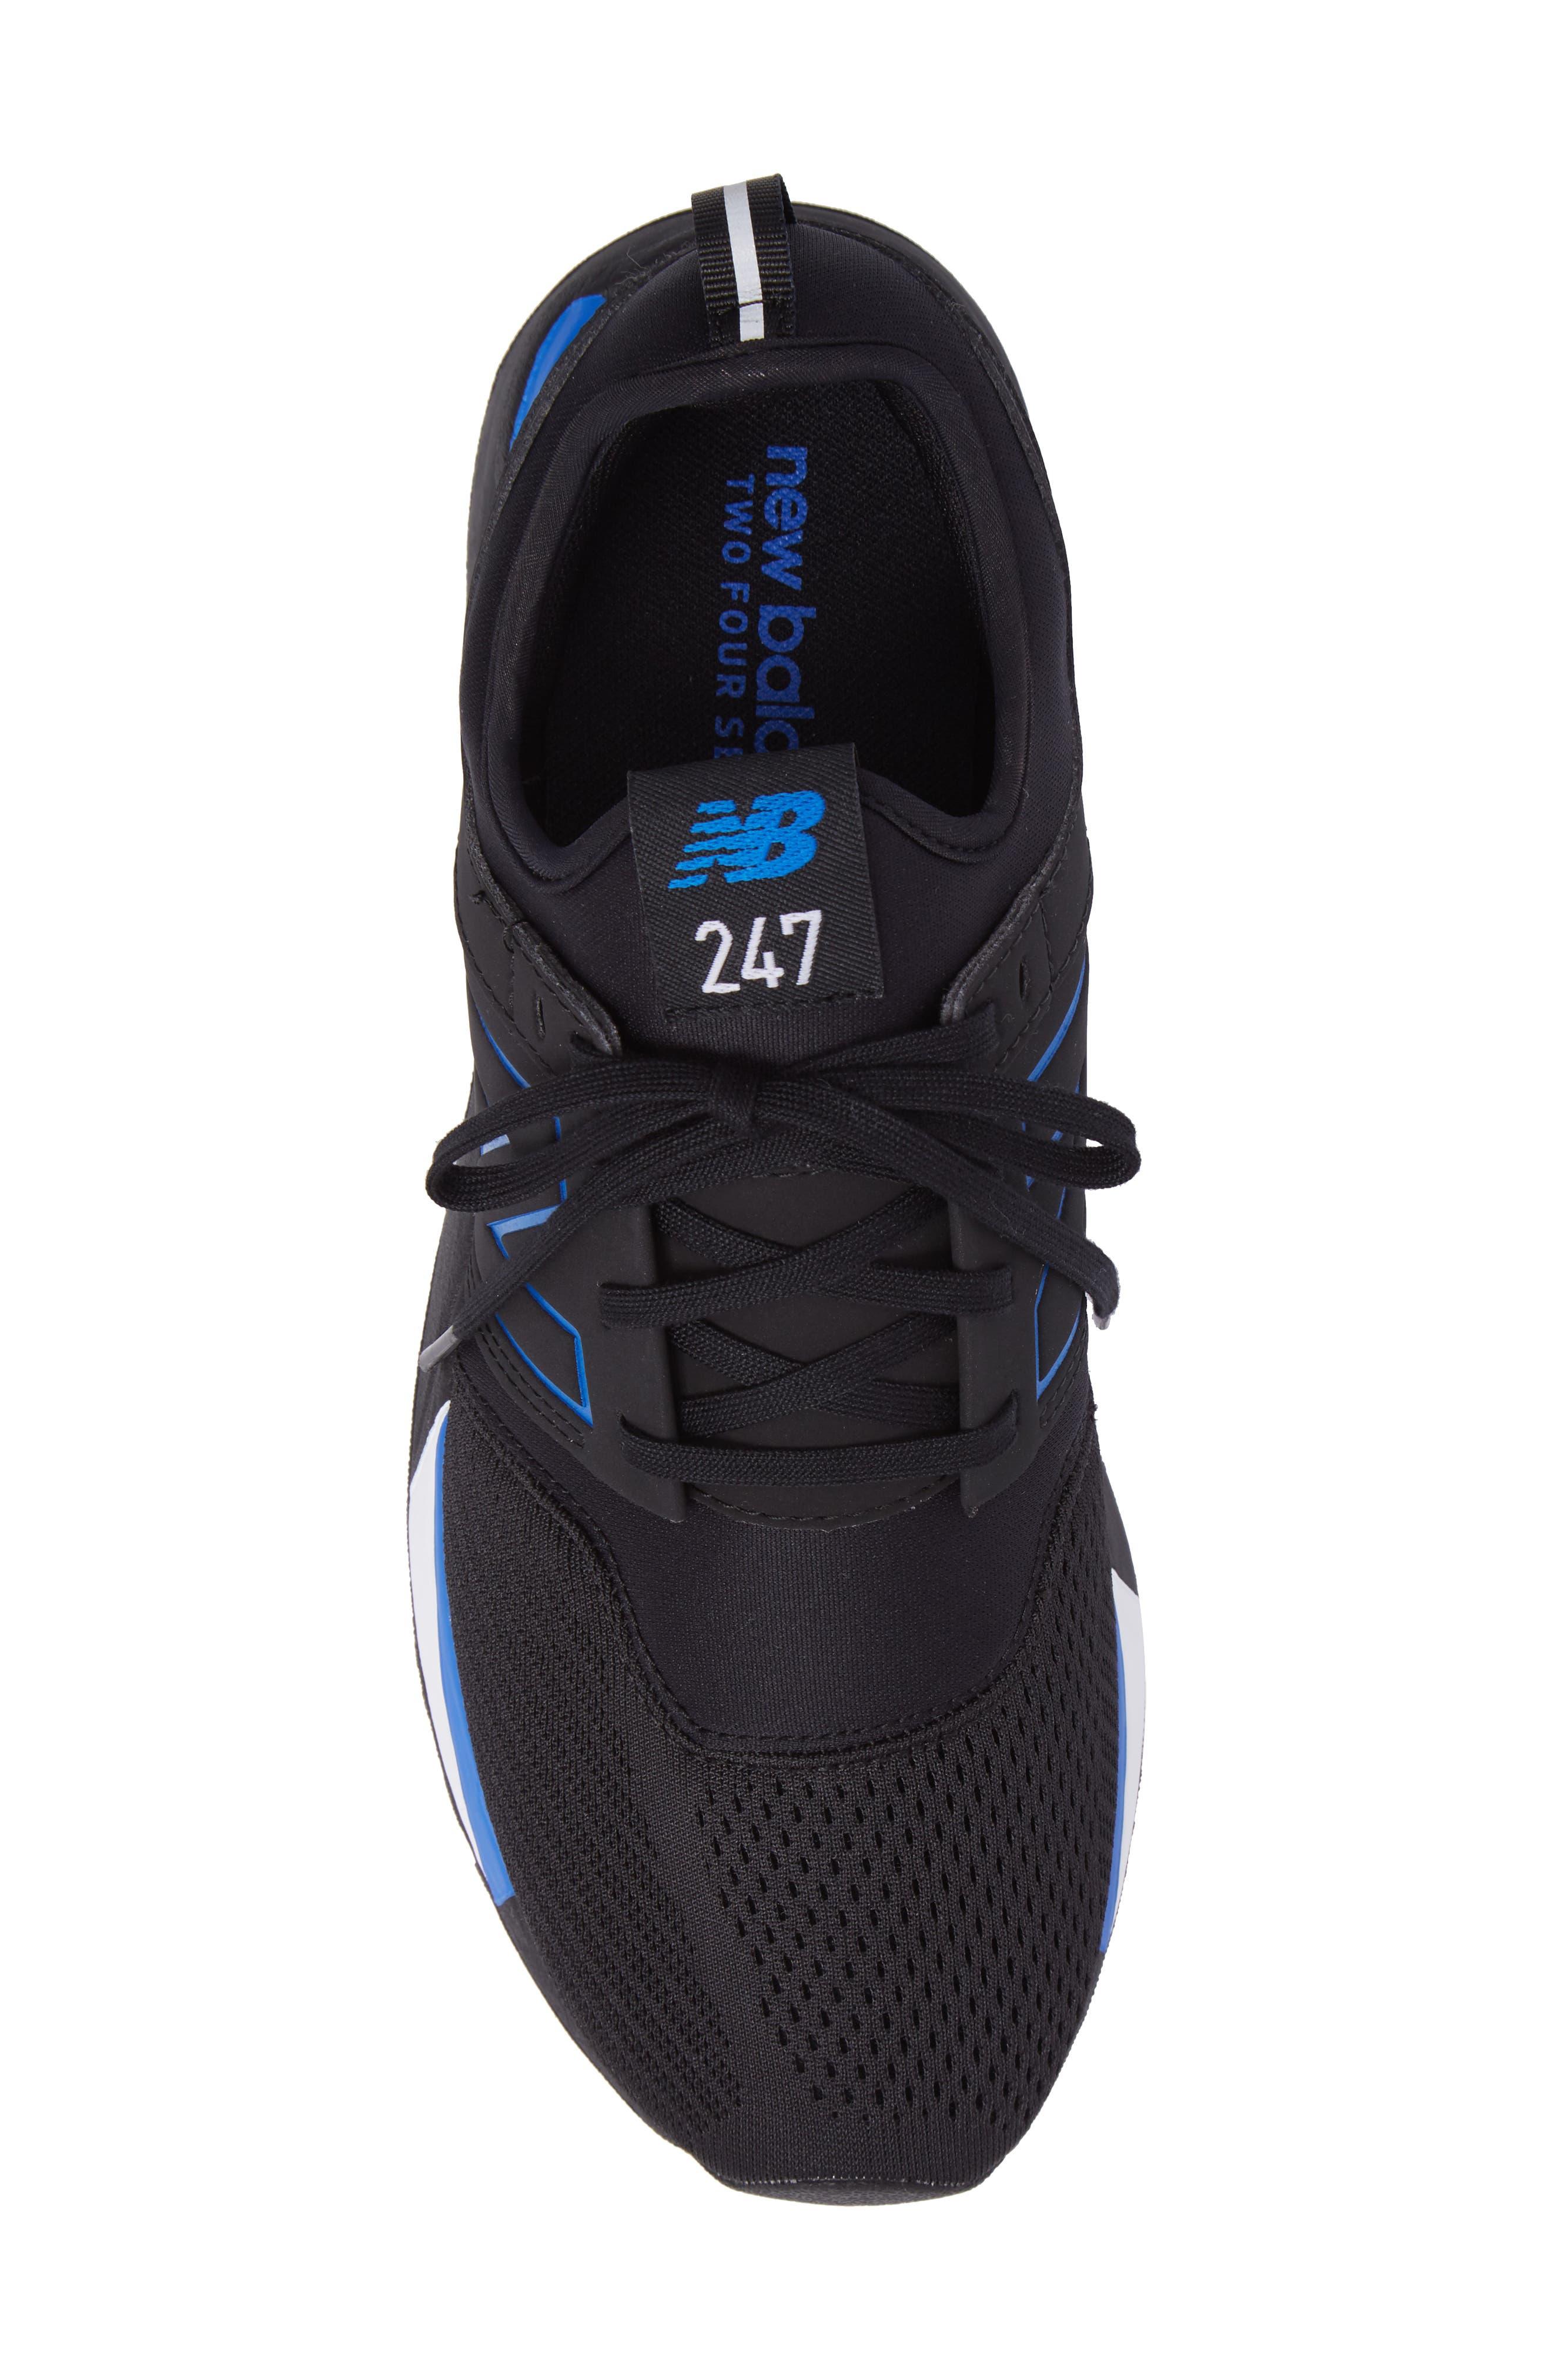 247 Sneaker,                             Alternate thumbnail 5, color,                             Black